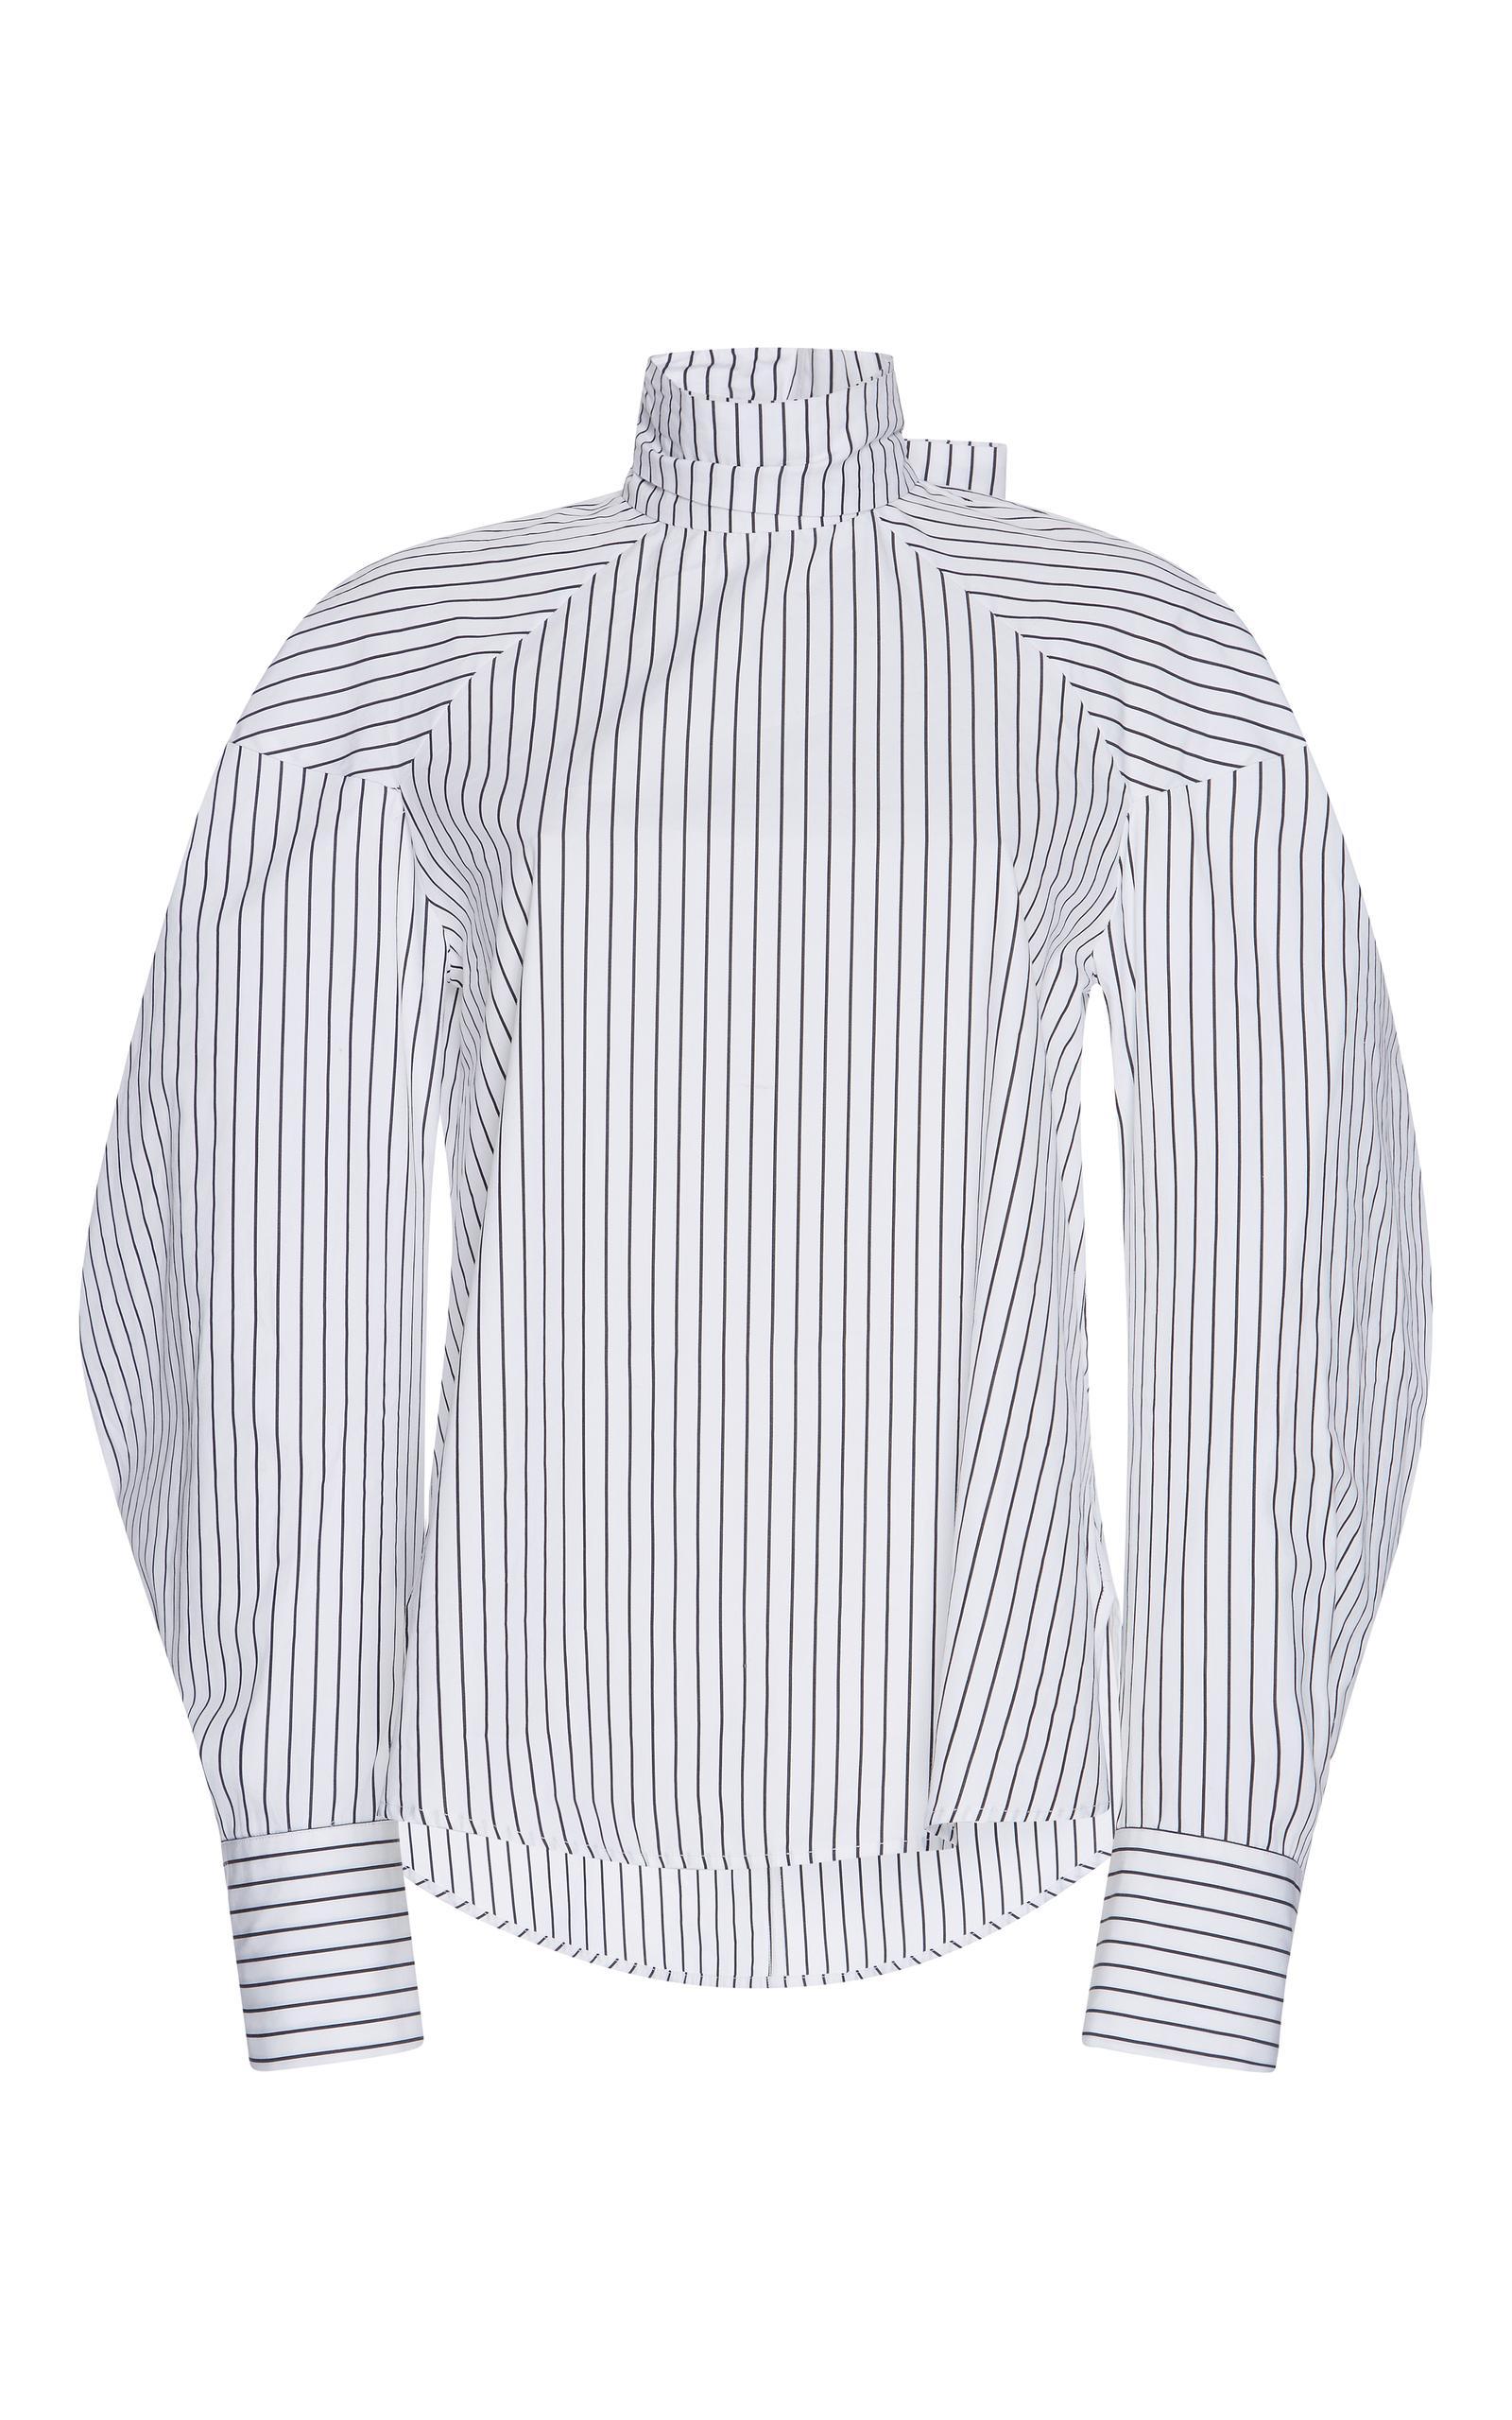 Msgm Pinstripe Bow-embellished Shirt In Black%2fwhite